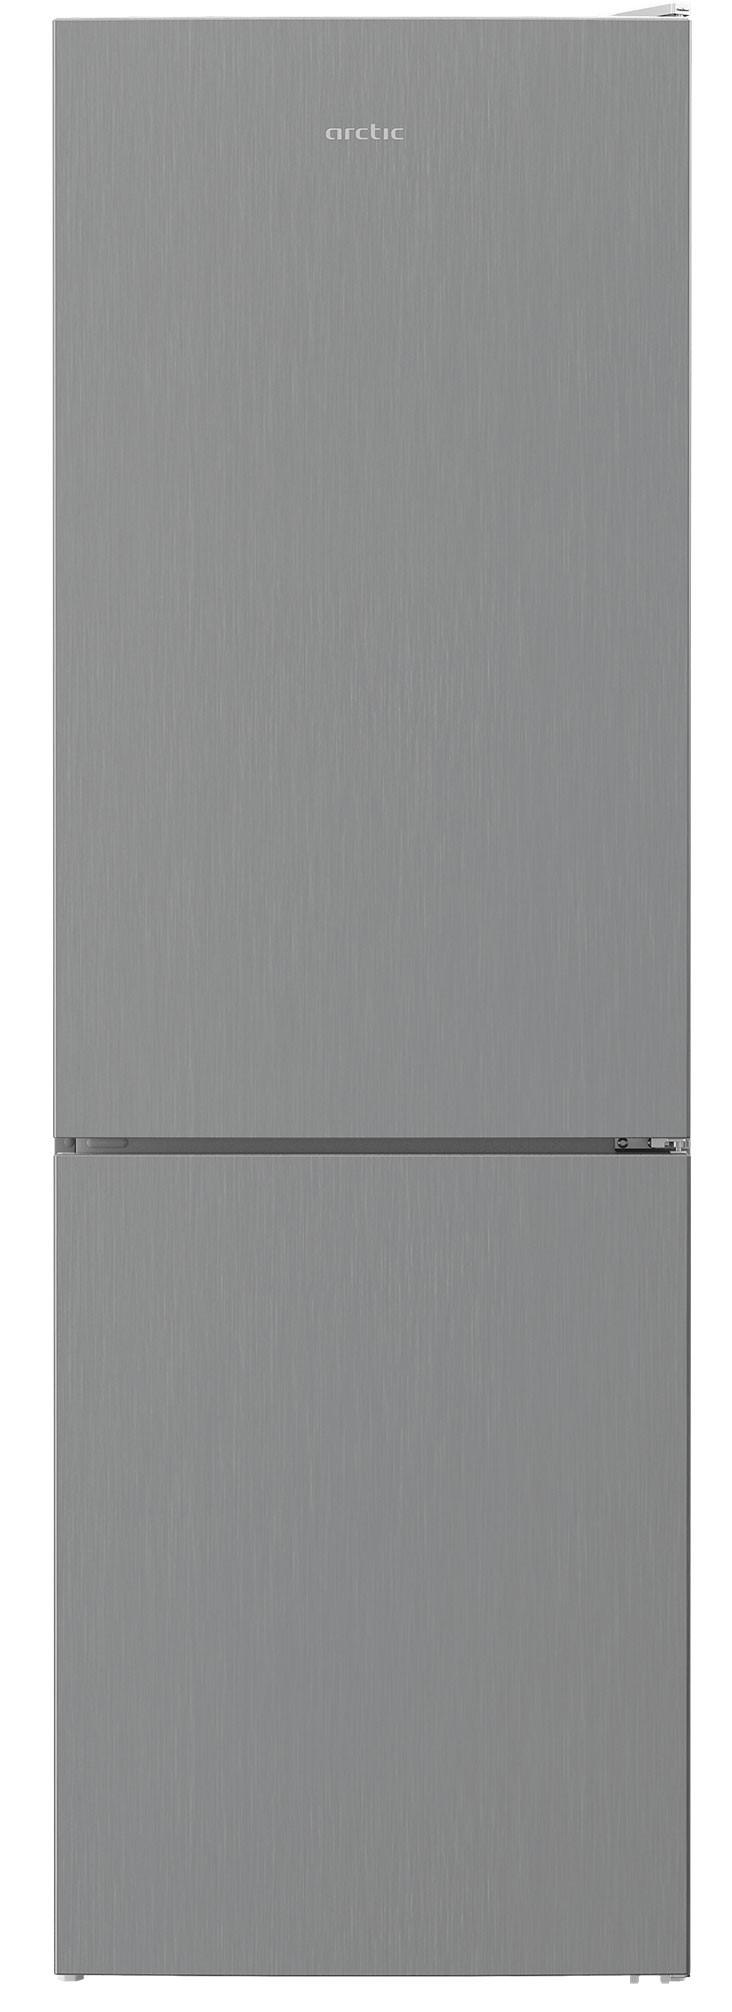 Combina frigorifica Arctic AK60366M40NFMT